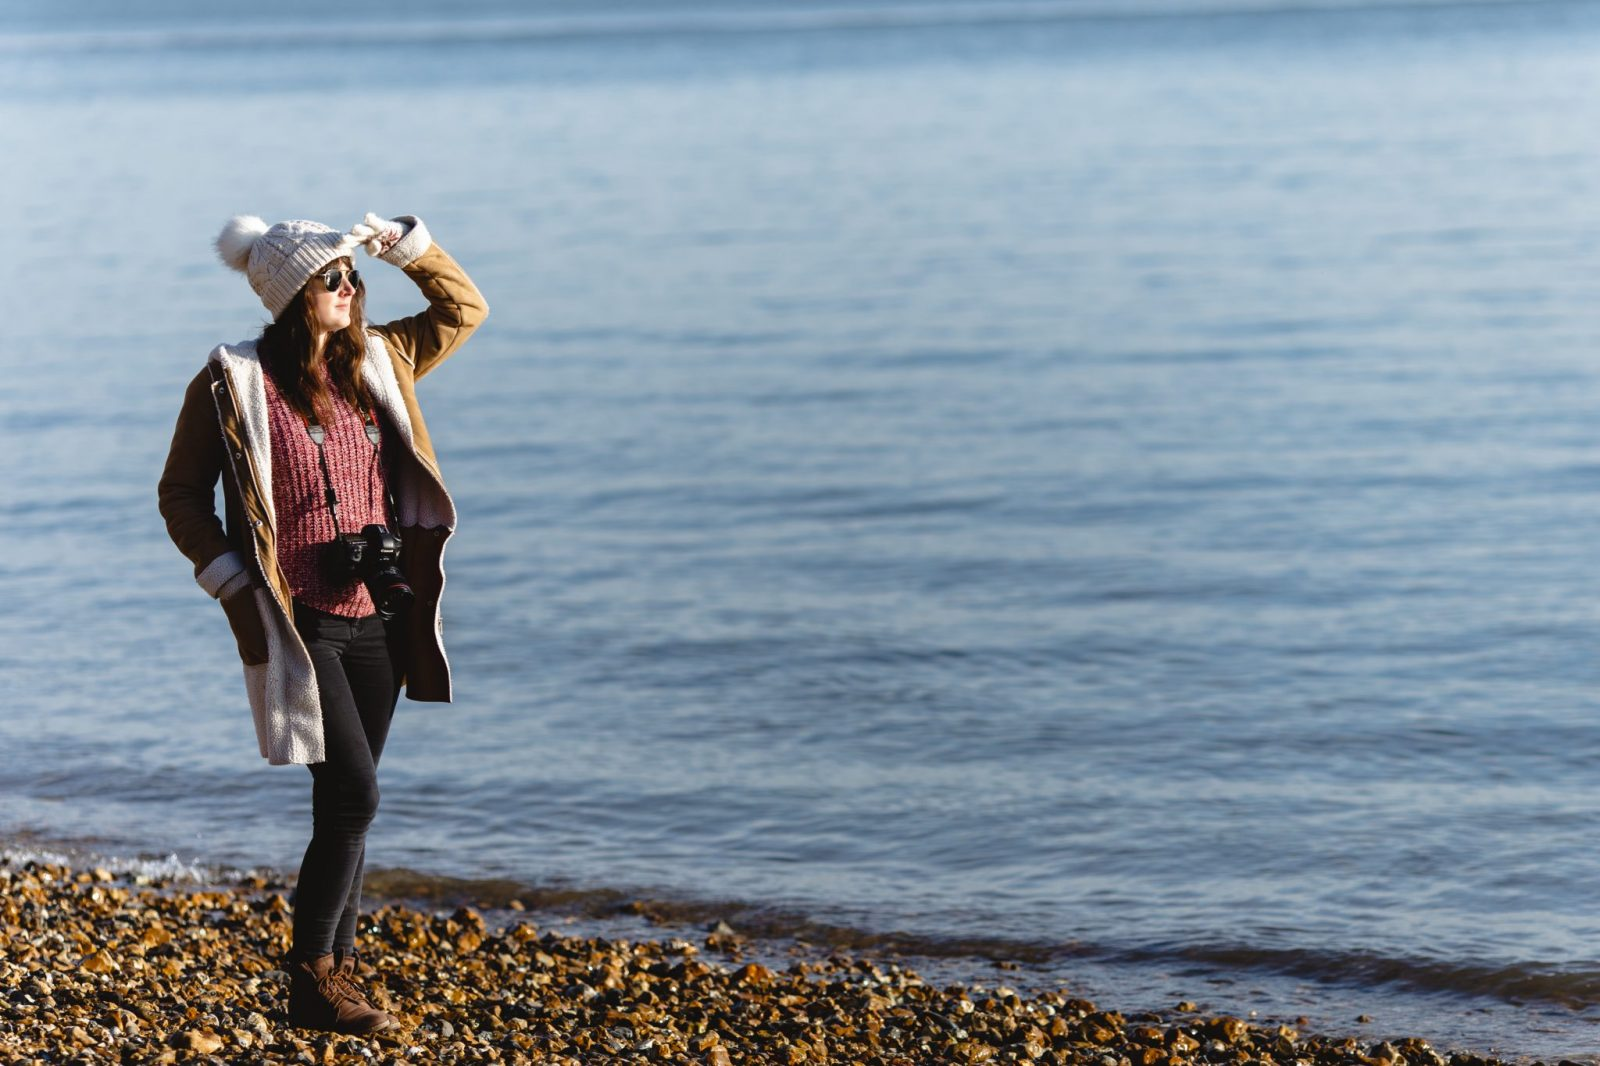 Lauren of Lahu Wedding Photography posing on Lepe Beach, Hampshire